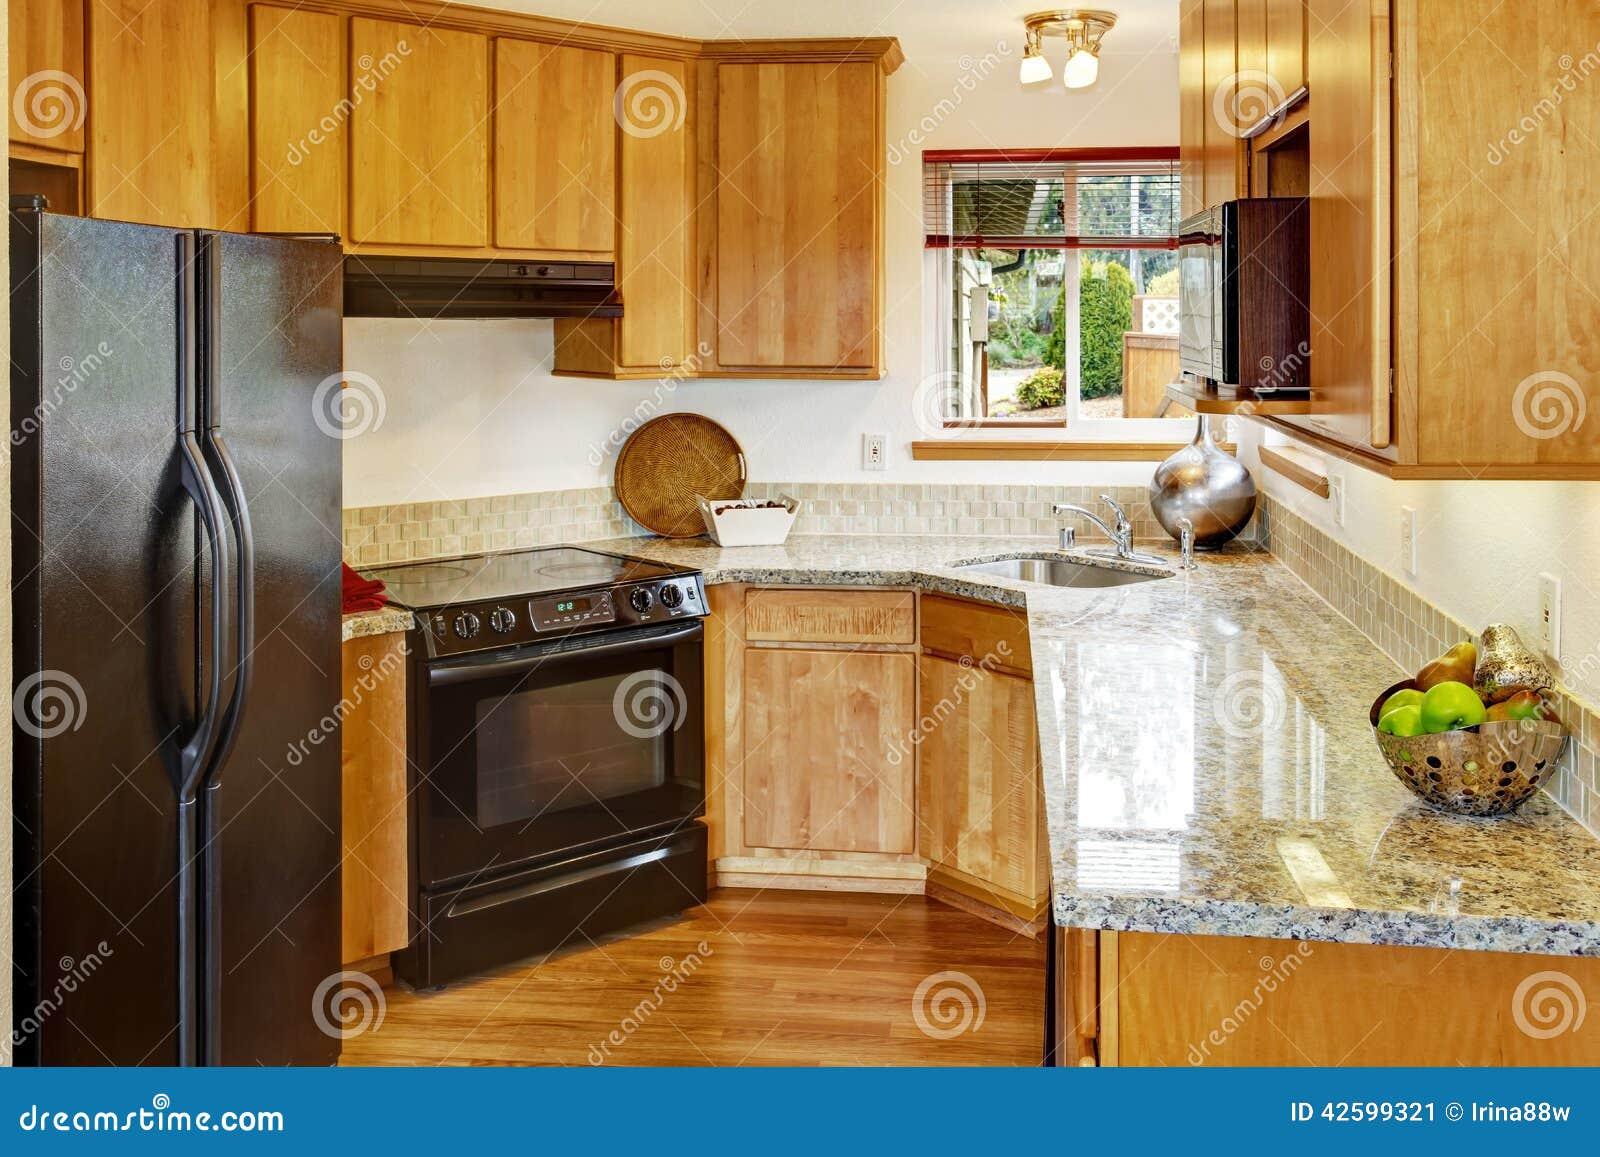 Small Kitchen Room Interior Stock Photo  Image 42599321